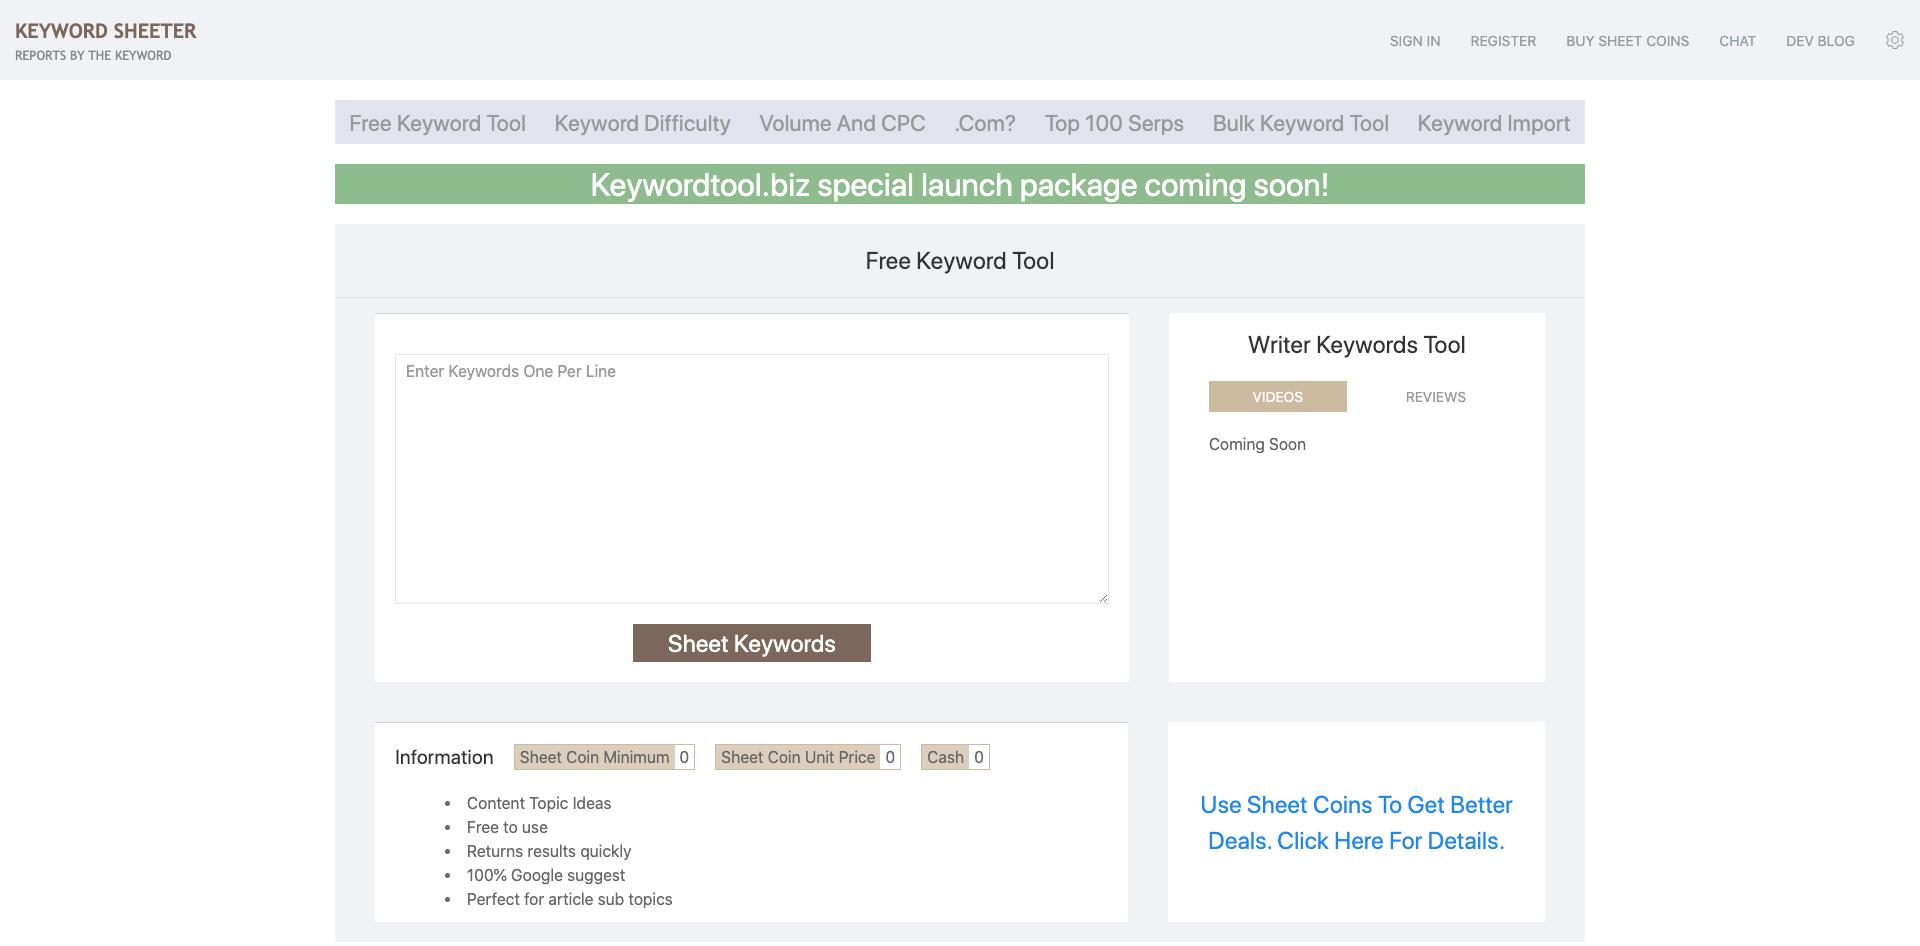 keywordsheeter.com